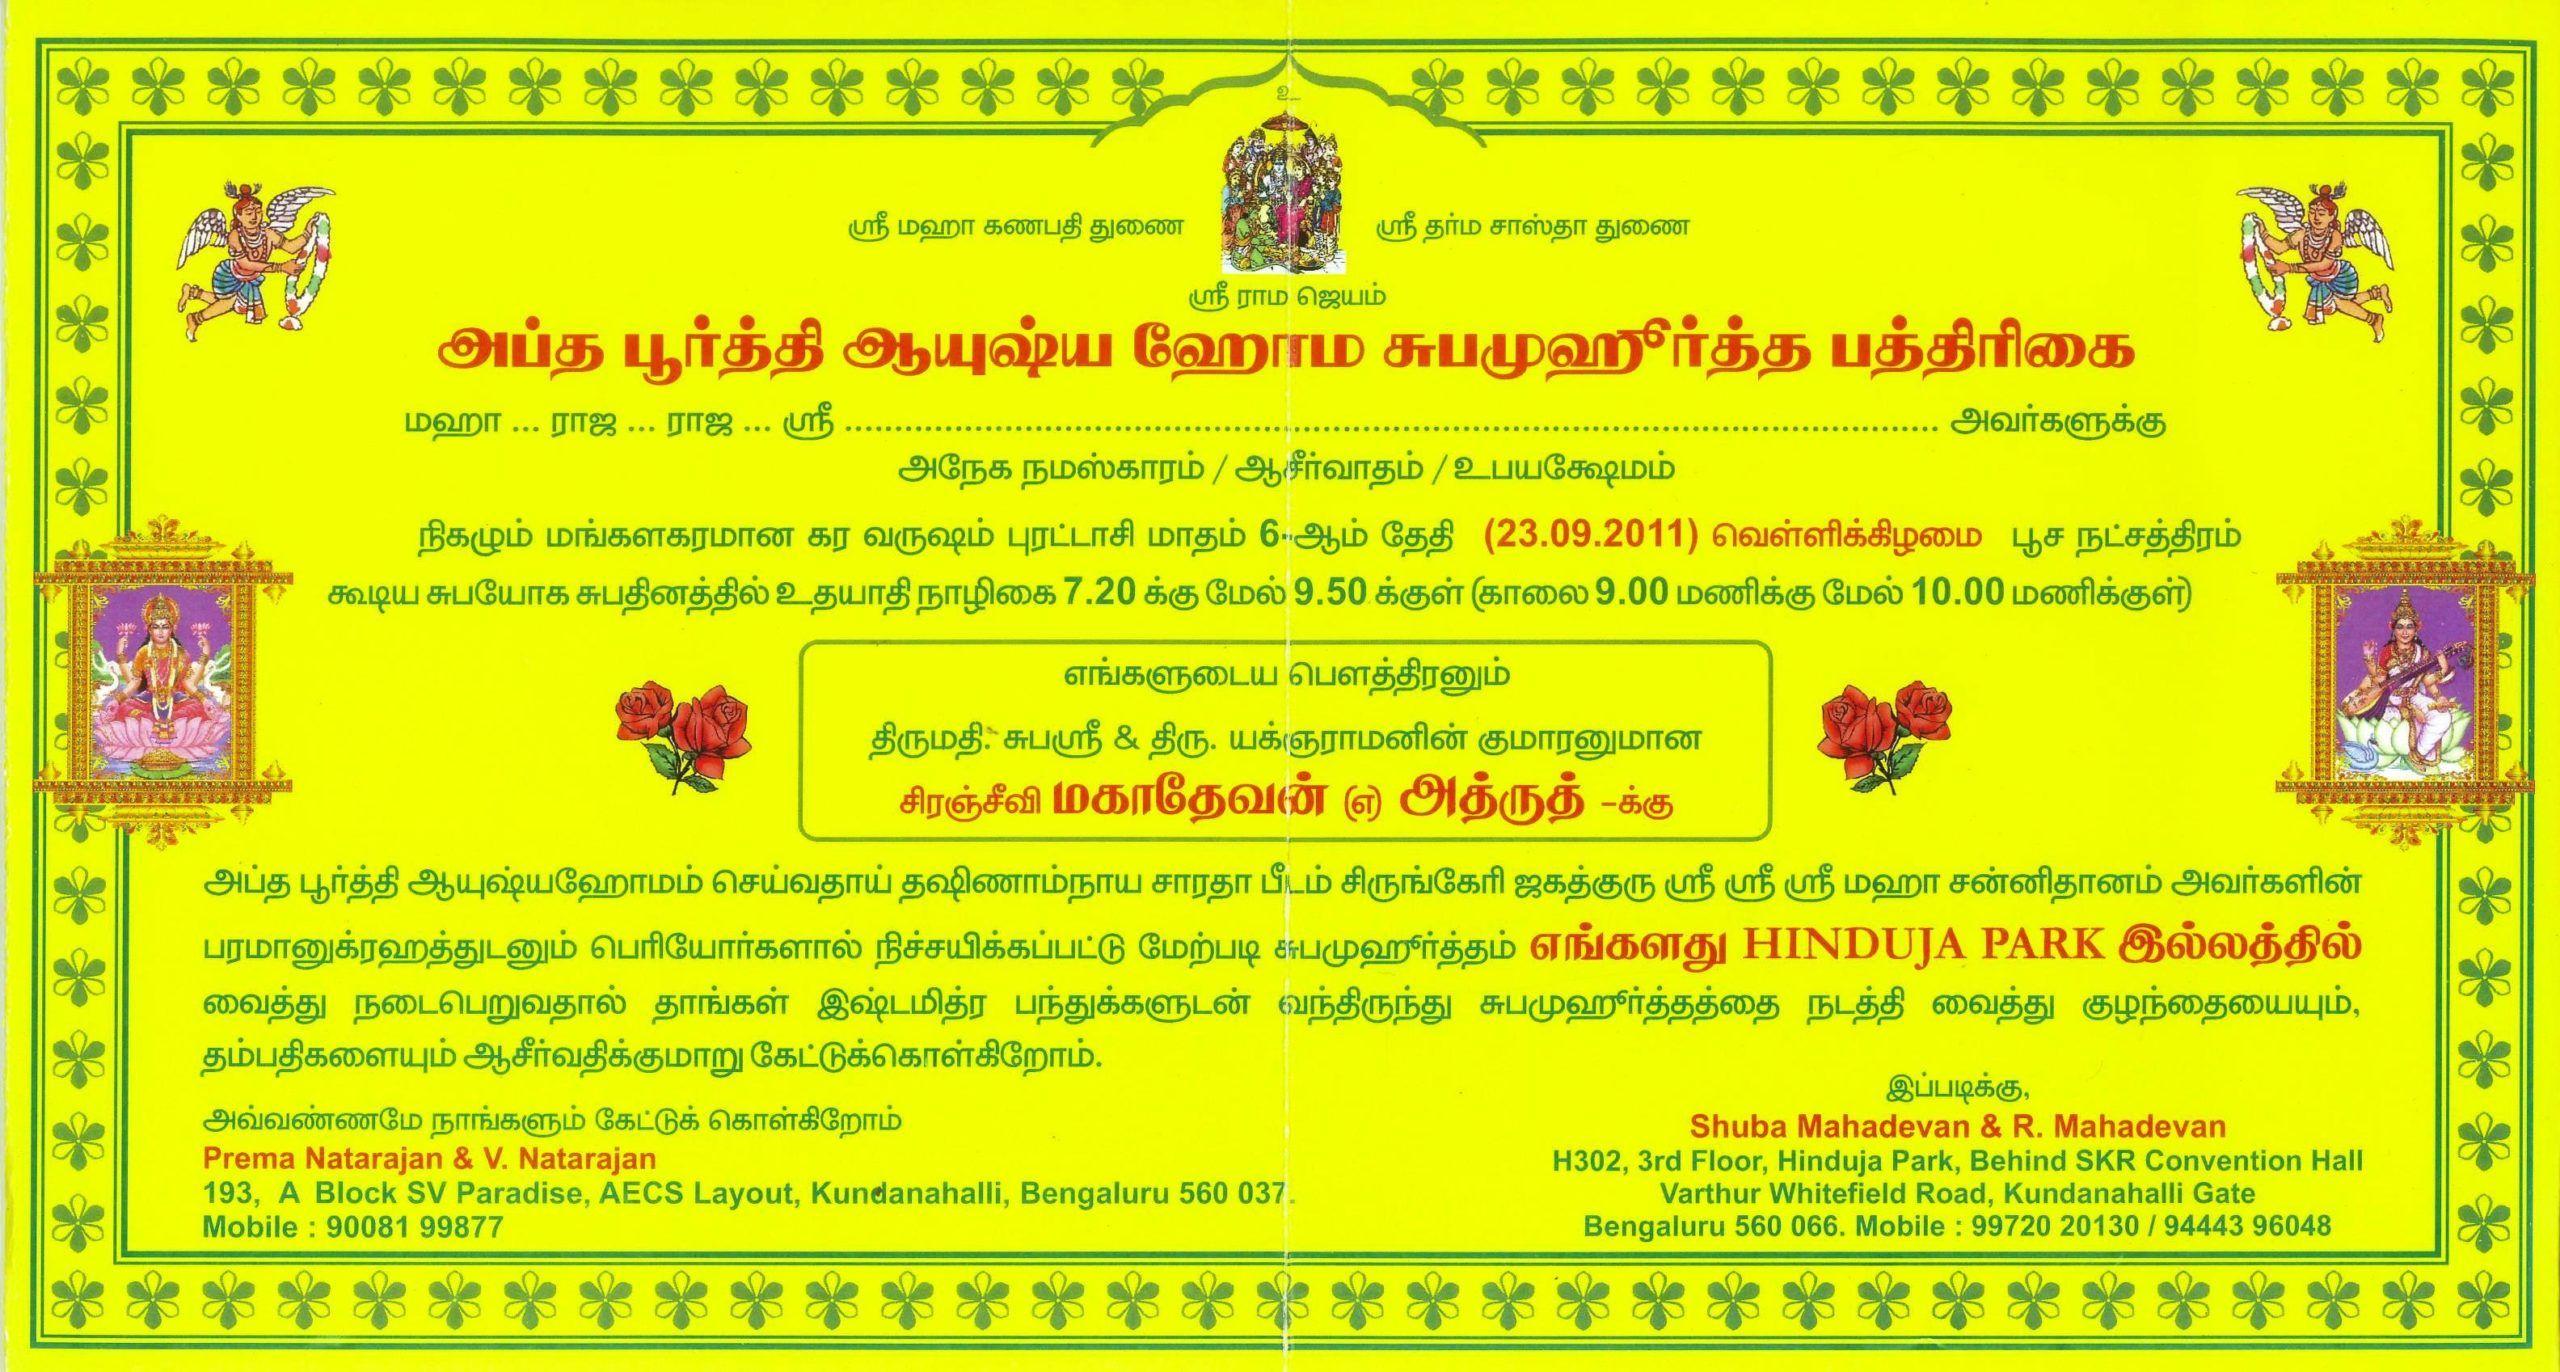 38 Housewarming Invitation Wording Samples In Tamil Engagement Invitation Template Free Wedding Invitation Templates Engagement Invitations